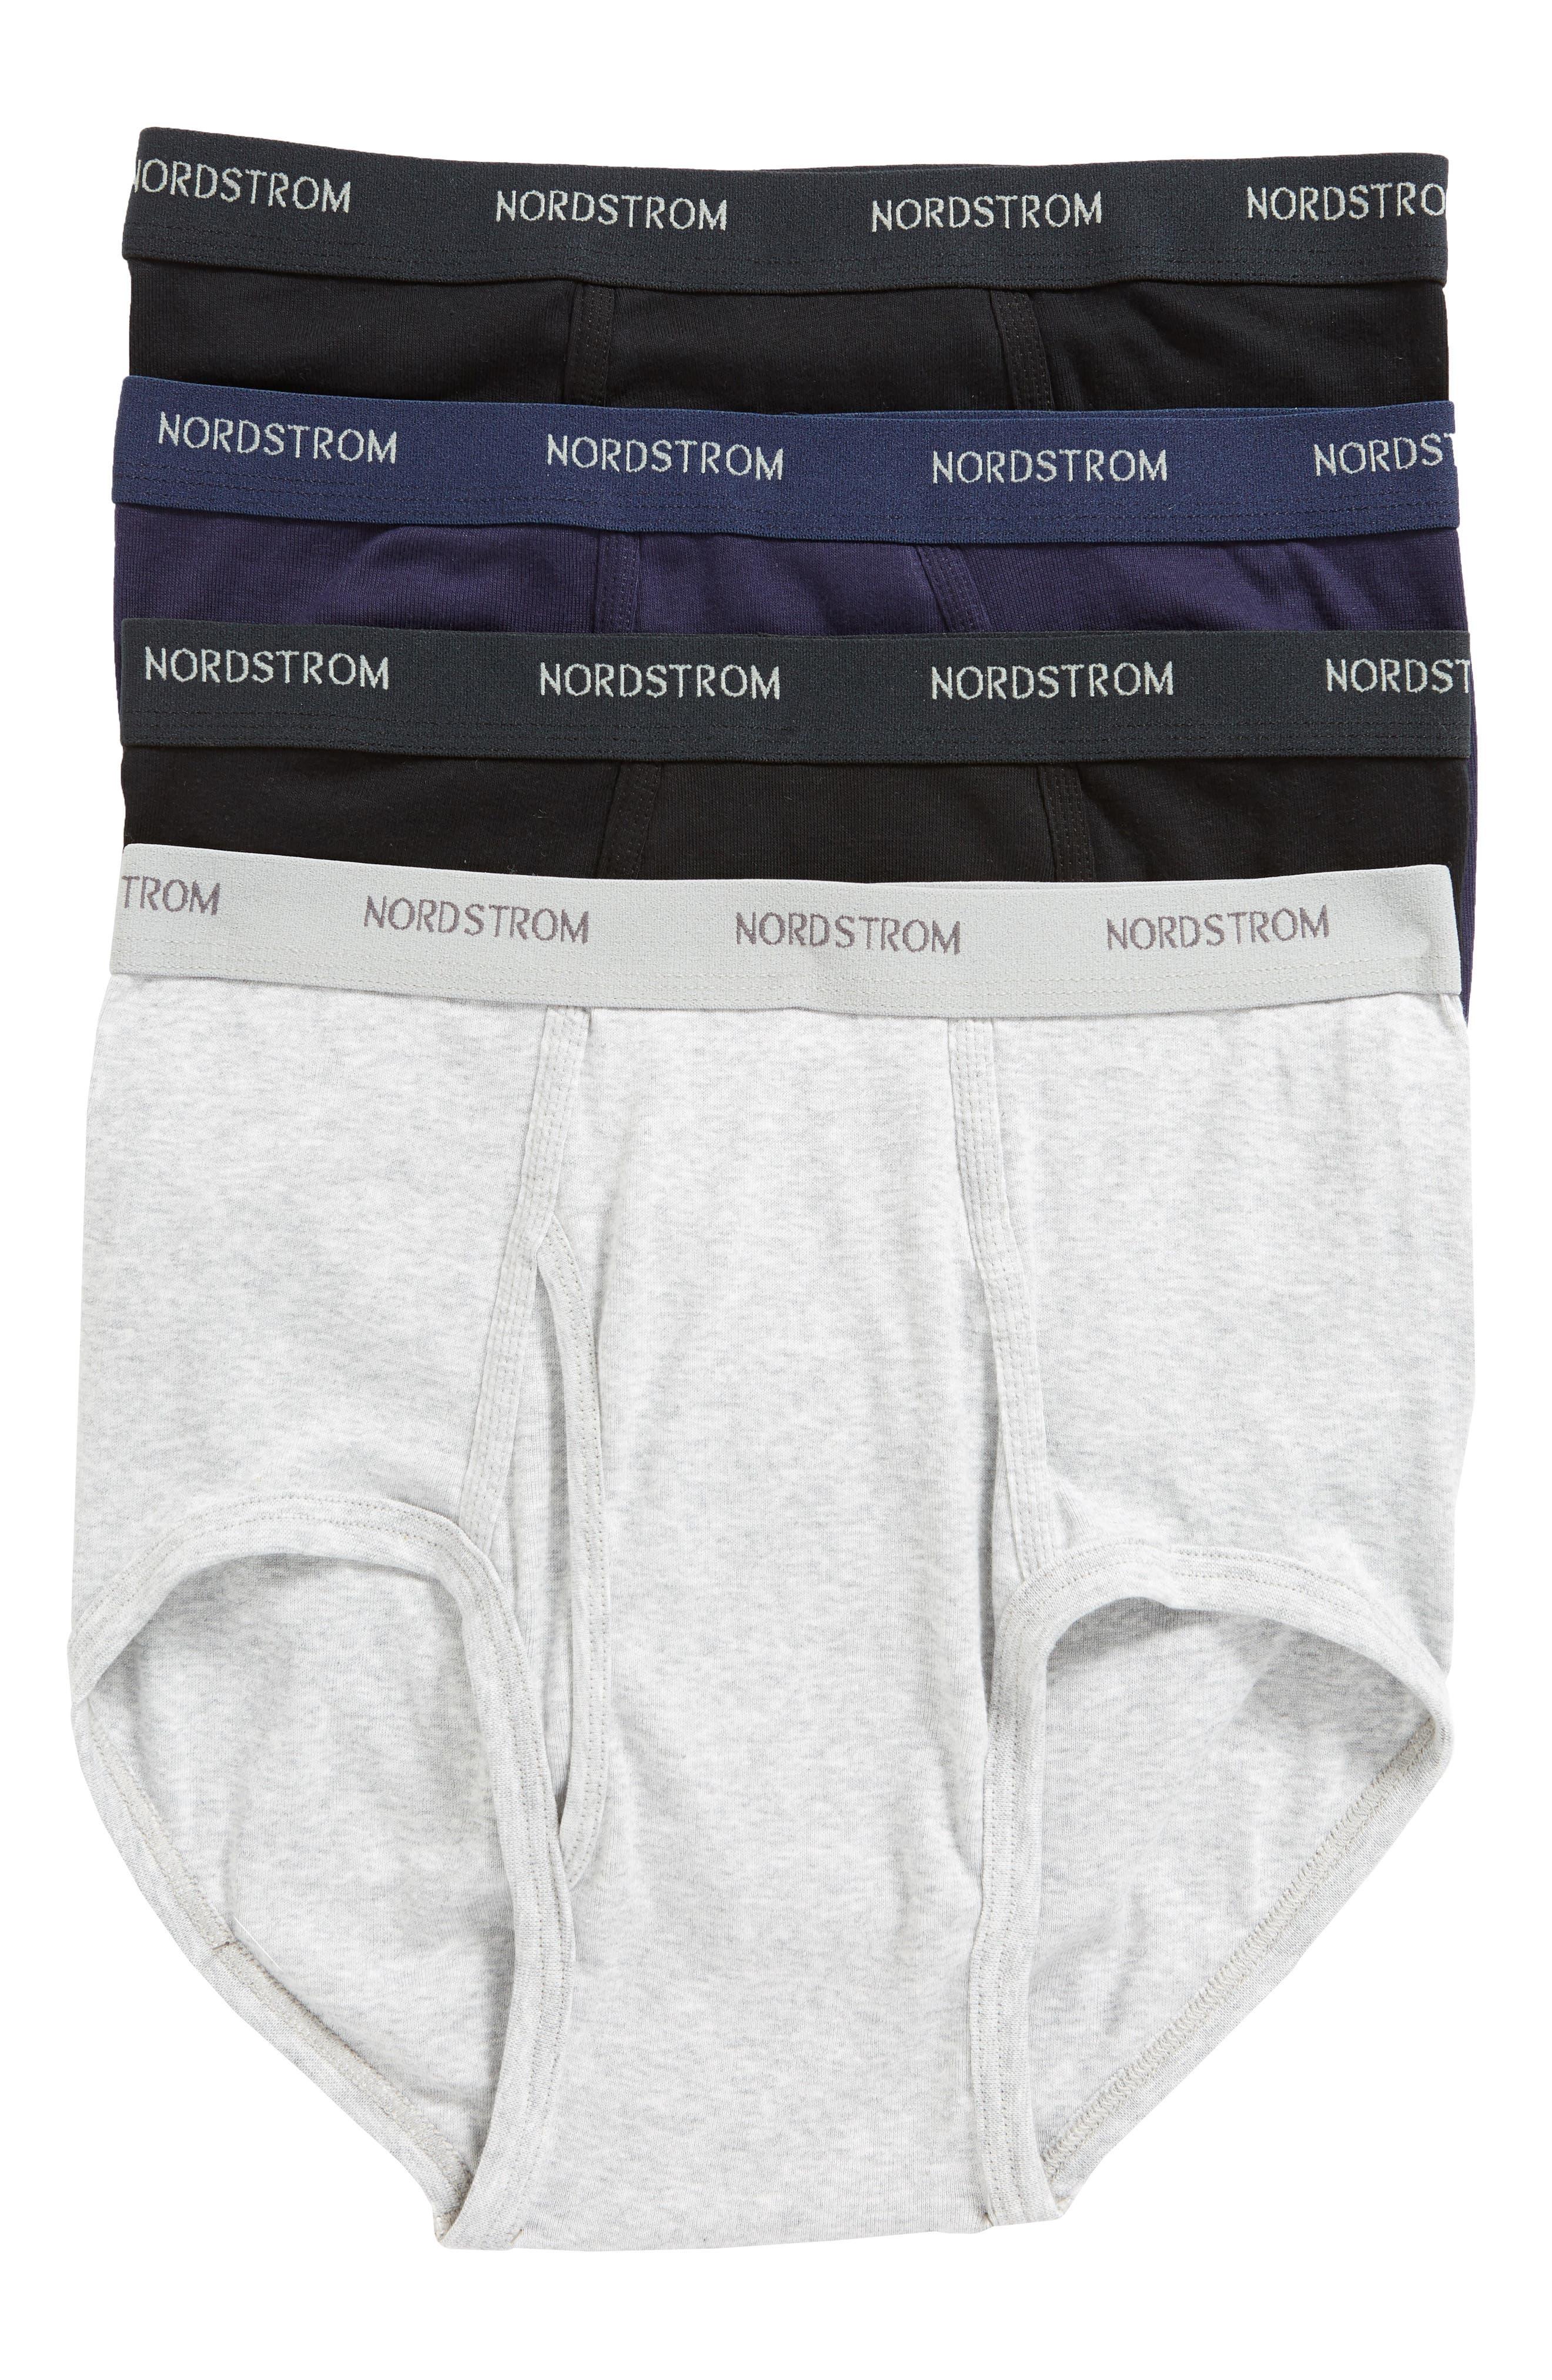 NORDSTROM MEN'S SHOP, 4-Pack Supima<sup>®</sup> Cotton Briefs, Main thumbnail 1, color, BLACK/ NAVY/ GREY